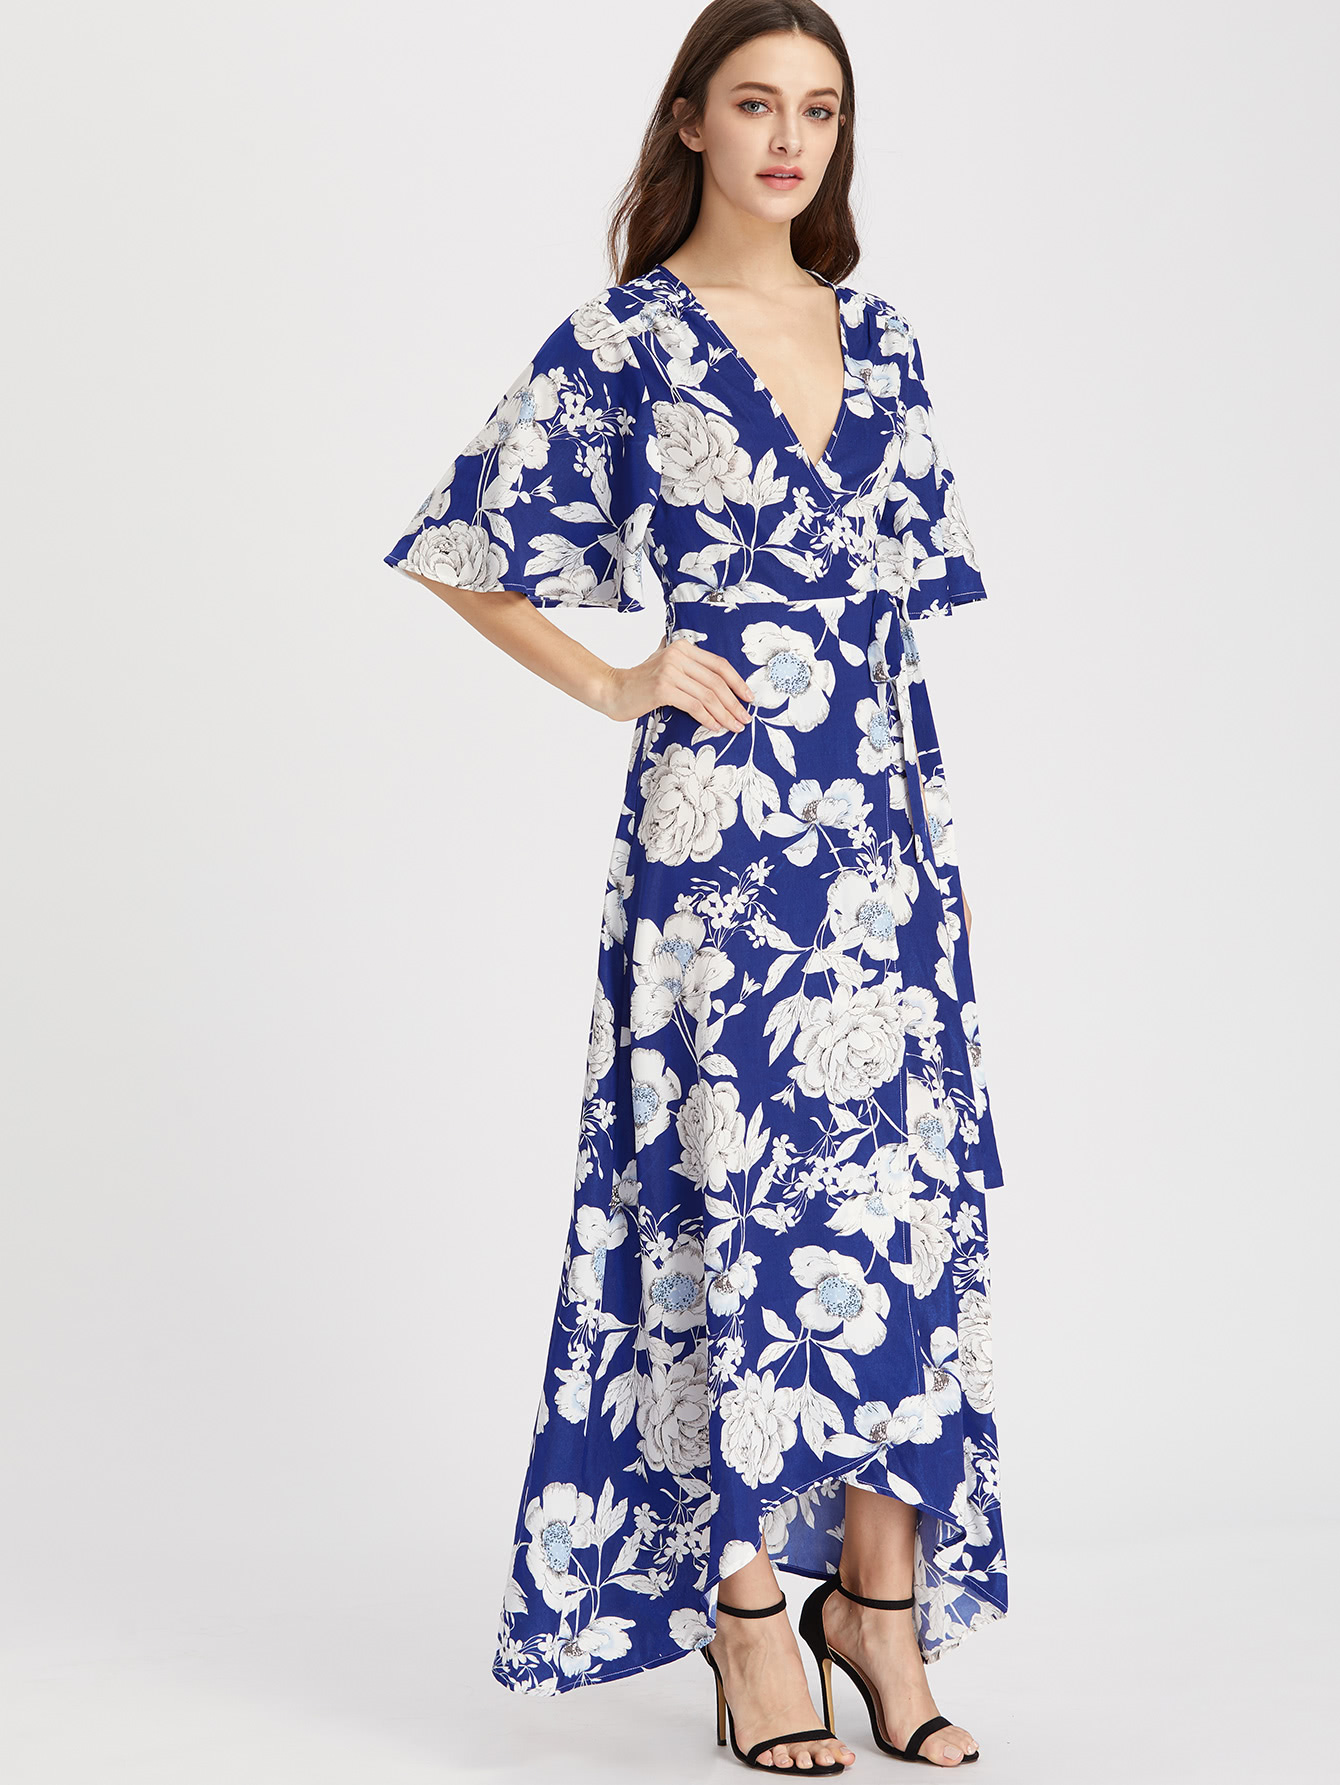 b17c693abb Flower Print Flutter Sleeve Surplice Wrap Dress -SheIn(Sheinside)